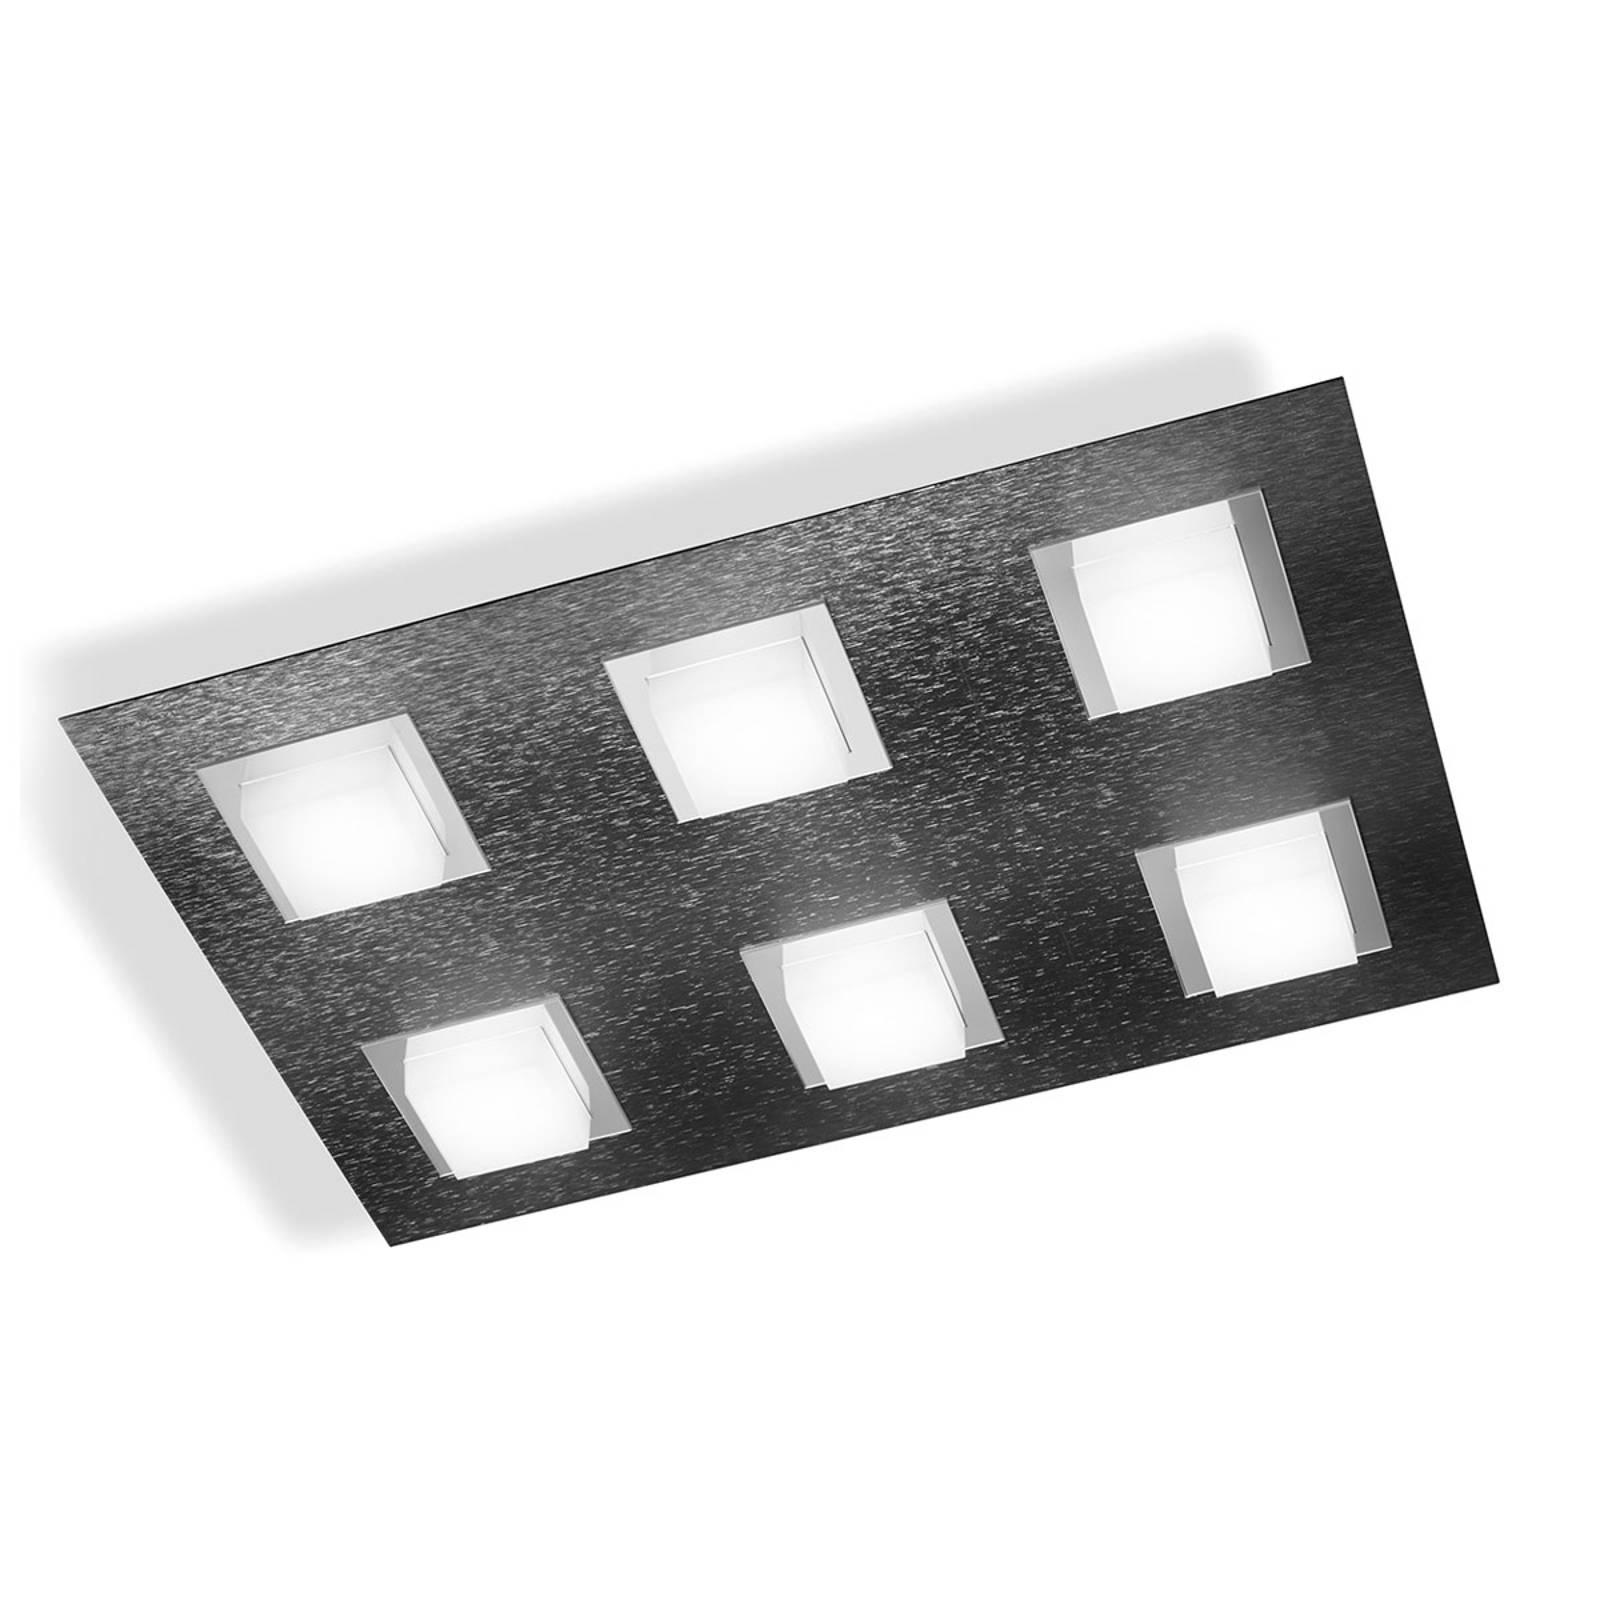 GROSSMANN Basic lampa sufitowa LED 6-pkt. antracyt